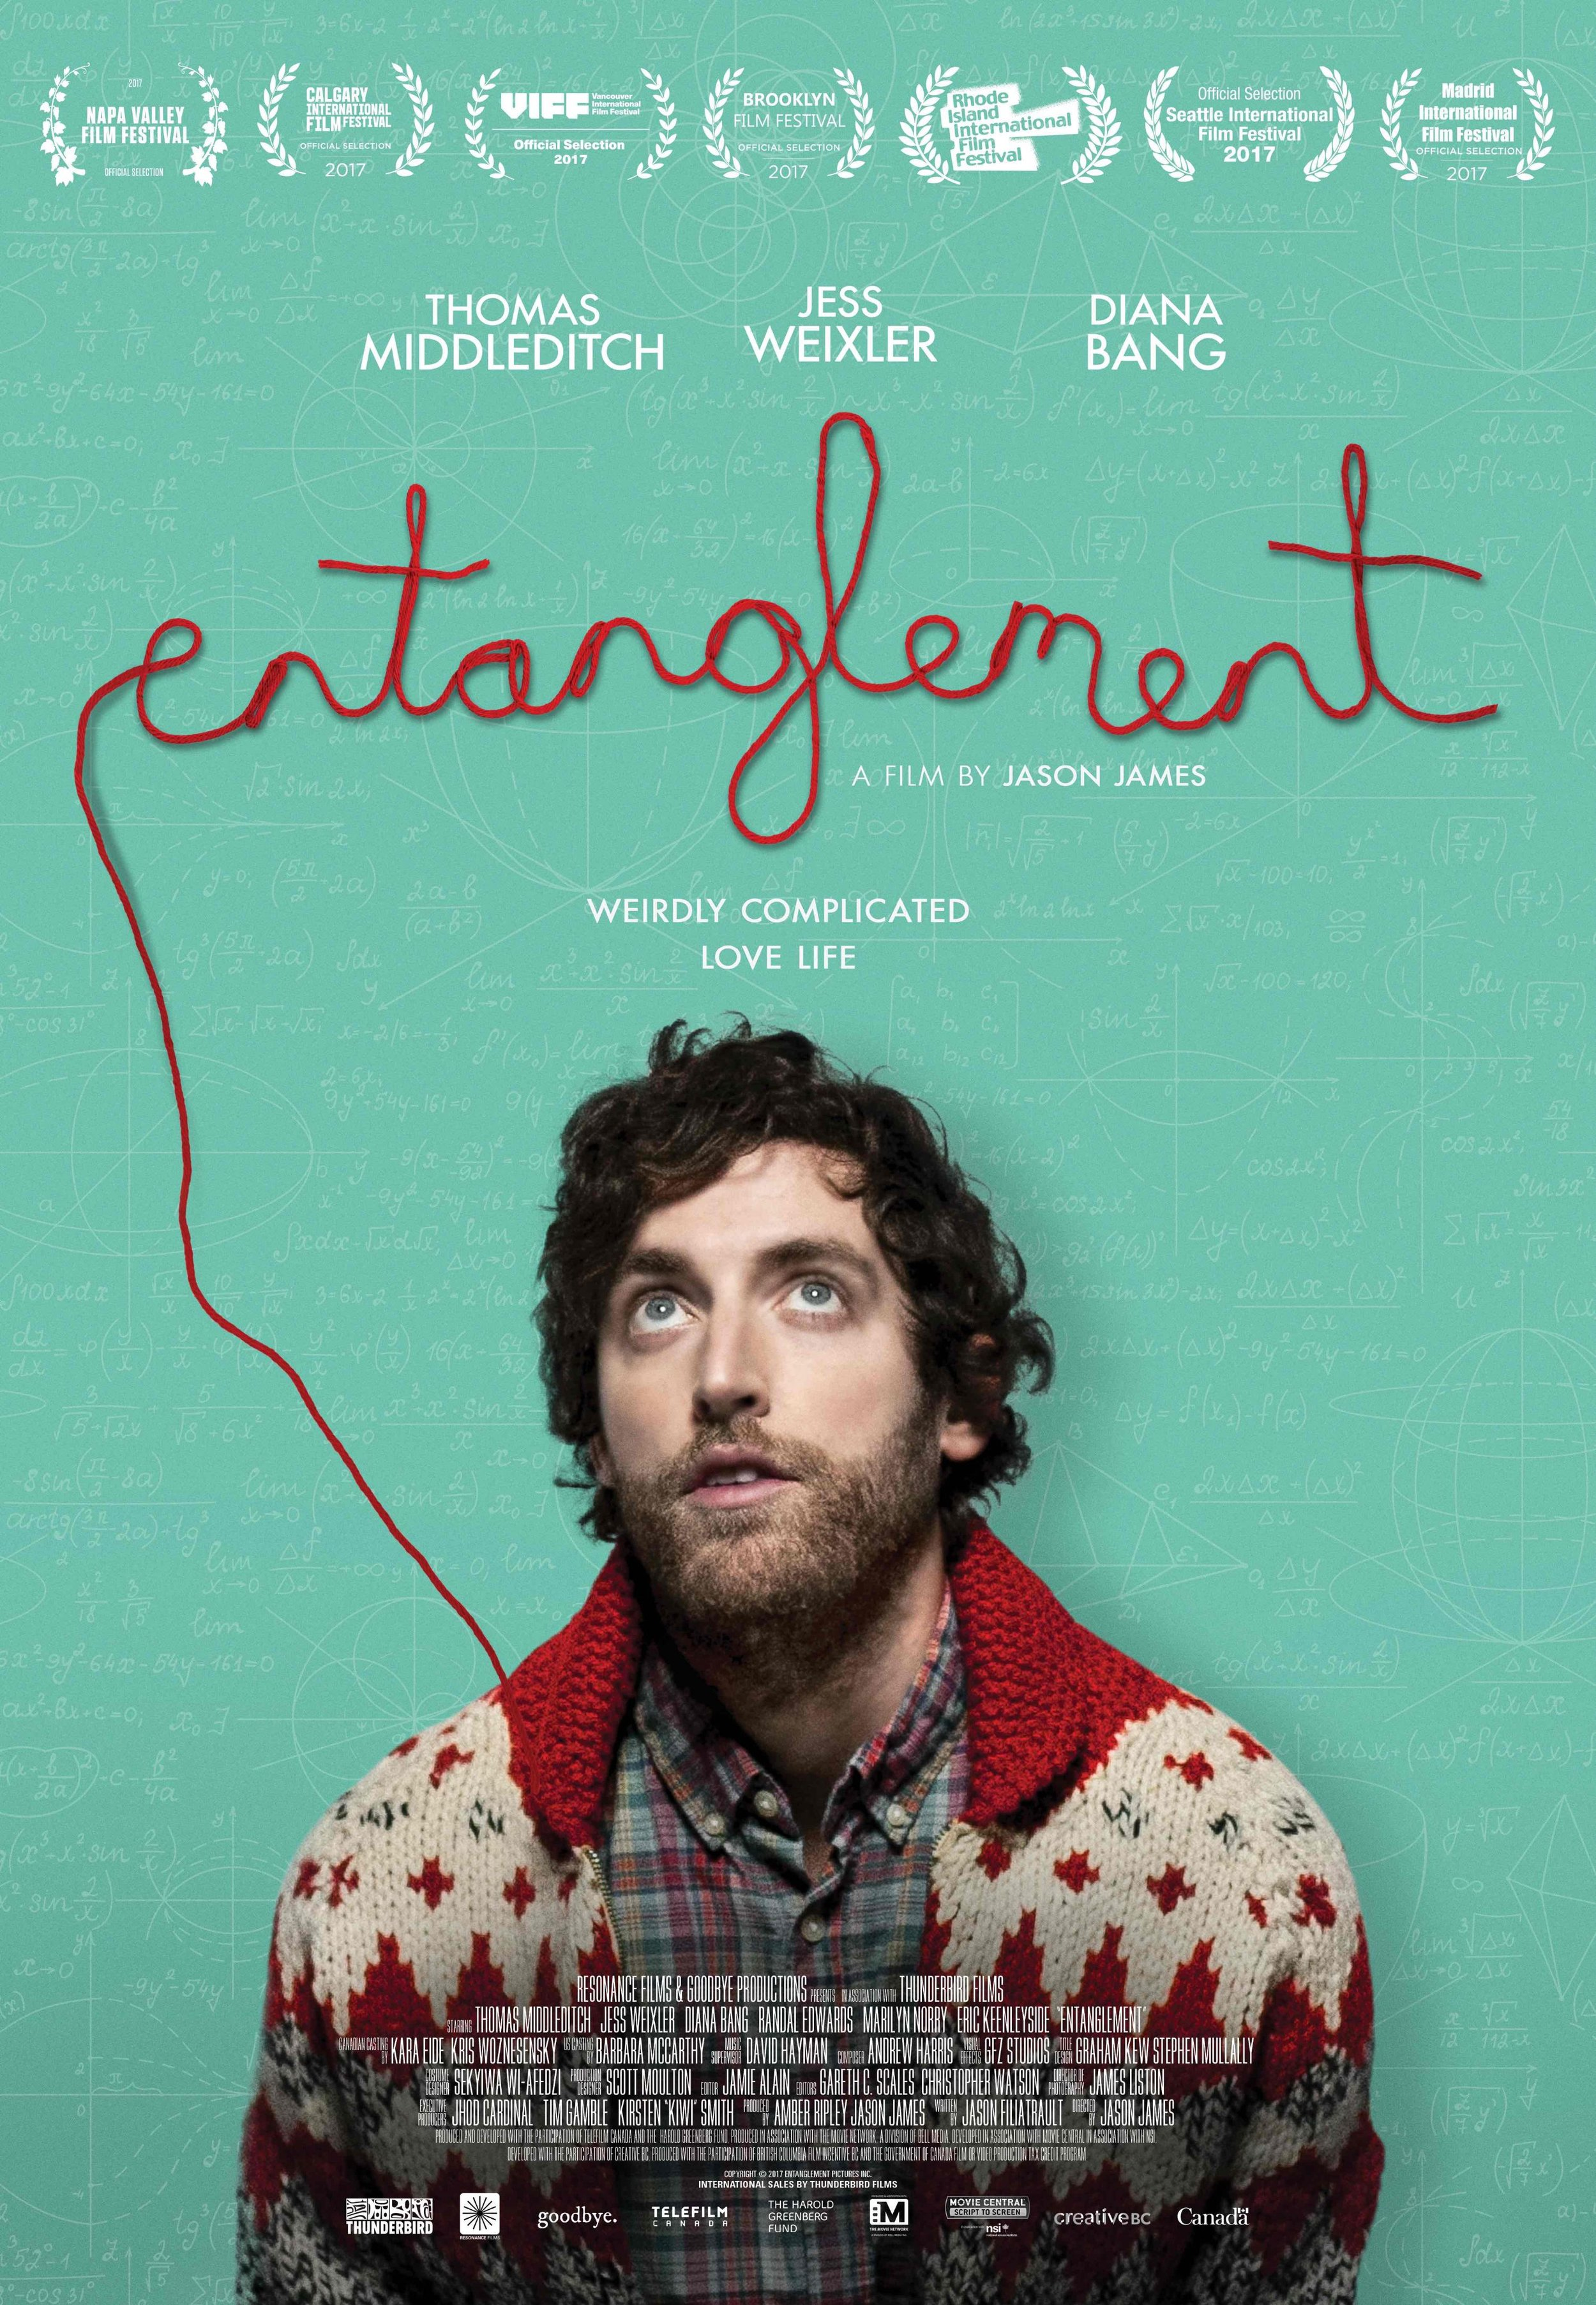 RGB_Digital_Entanglement_Poster_with_Laurels.jpg